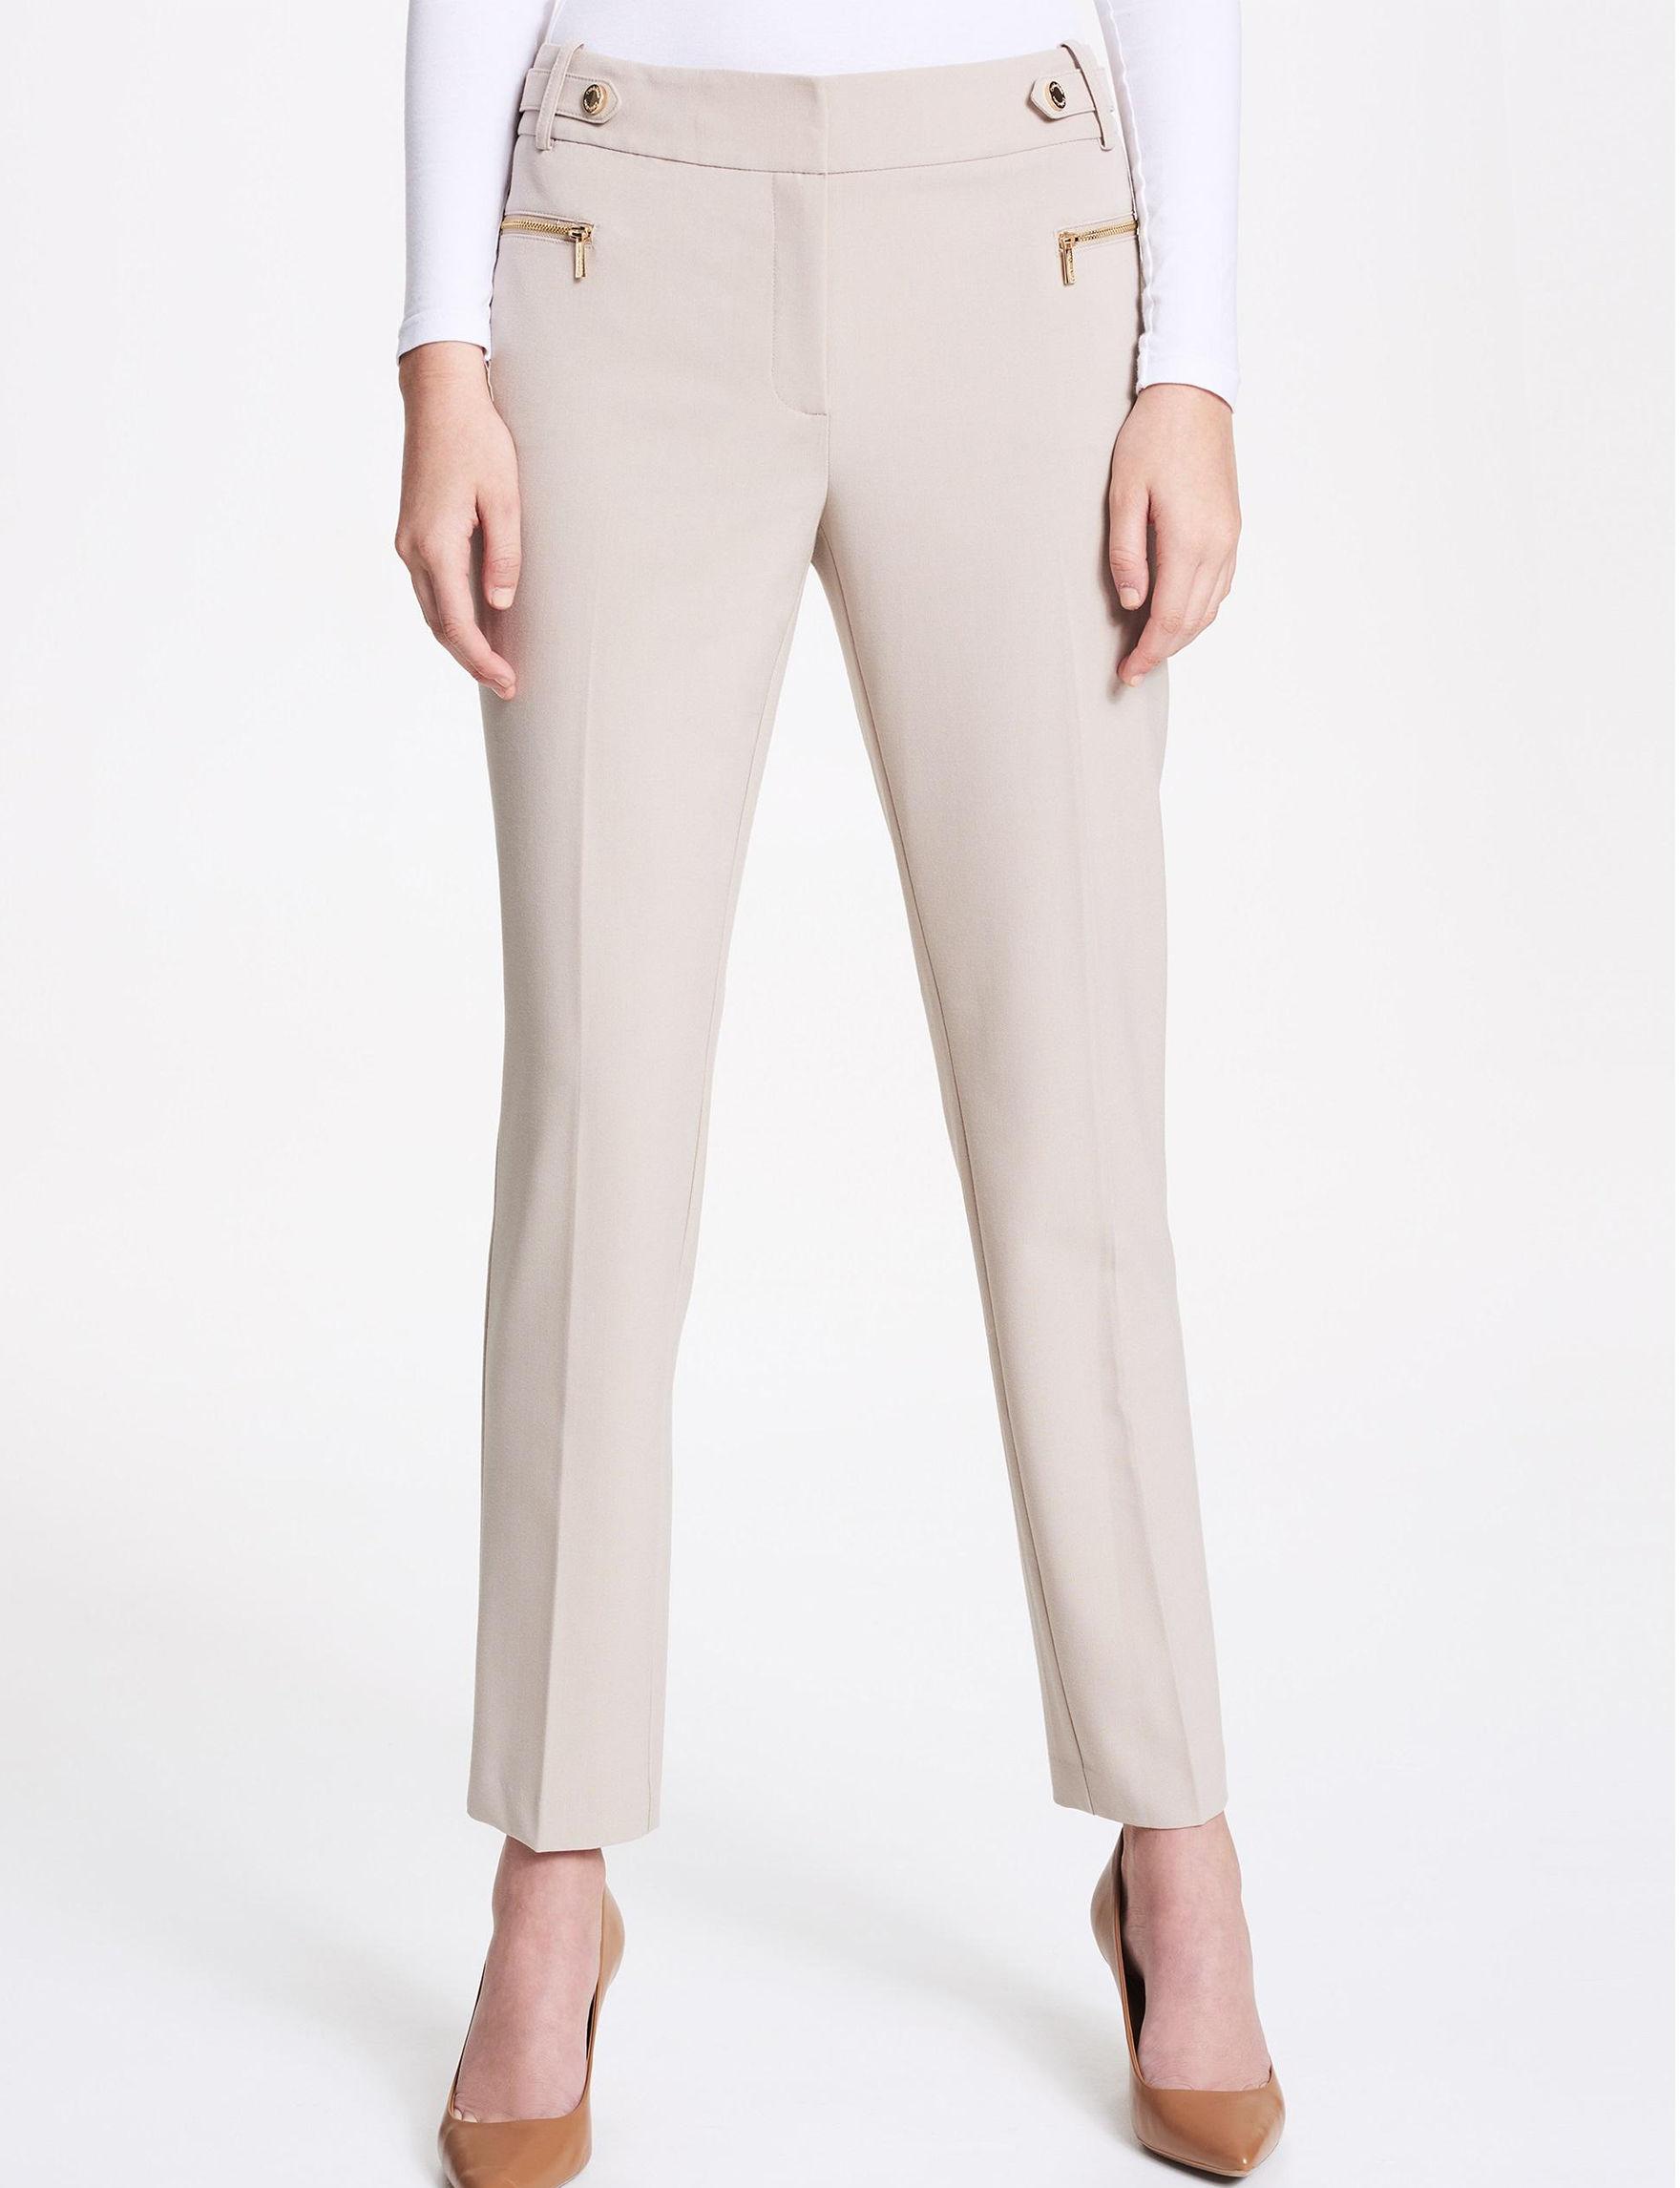 Calvin Klein Latte Soft Pants